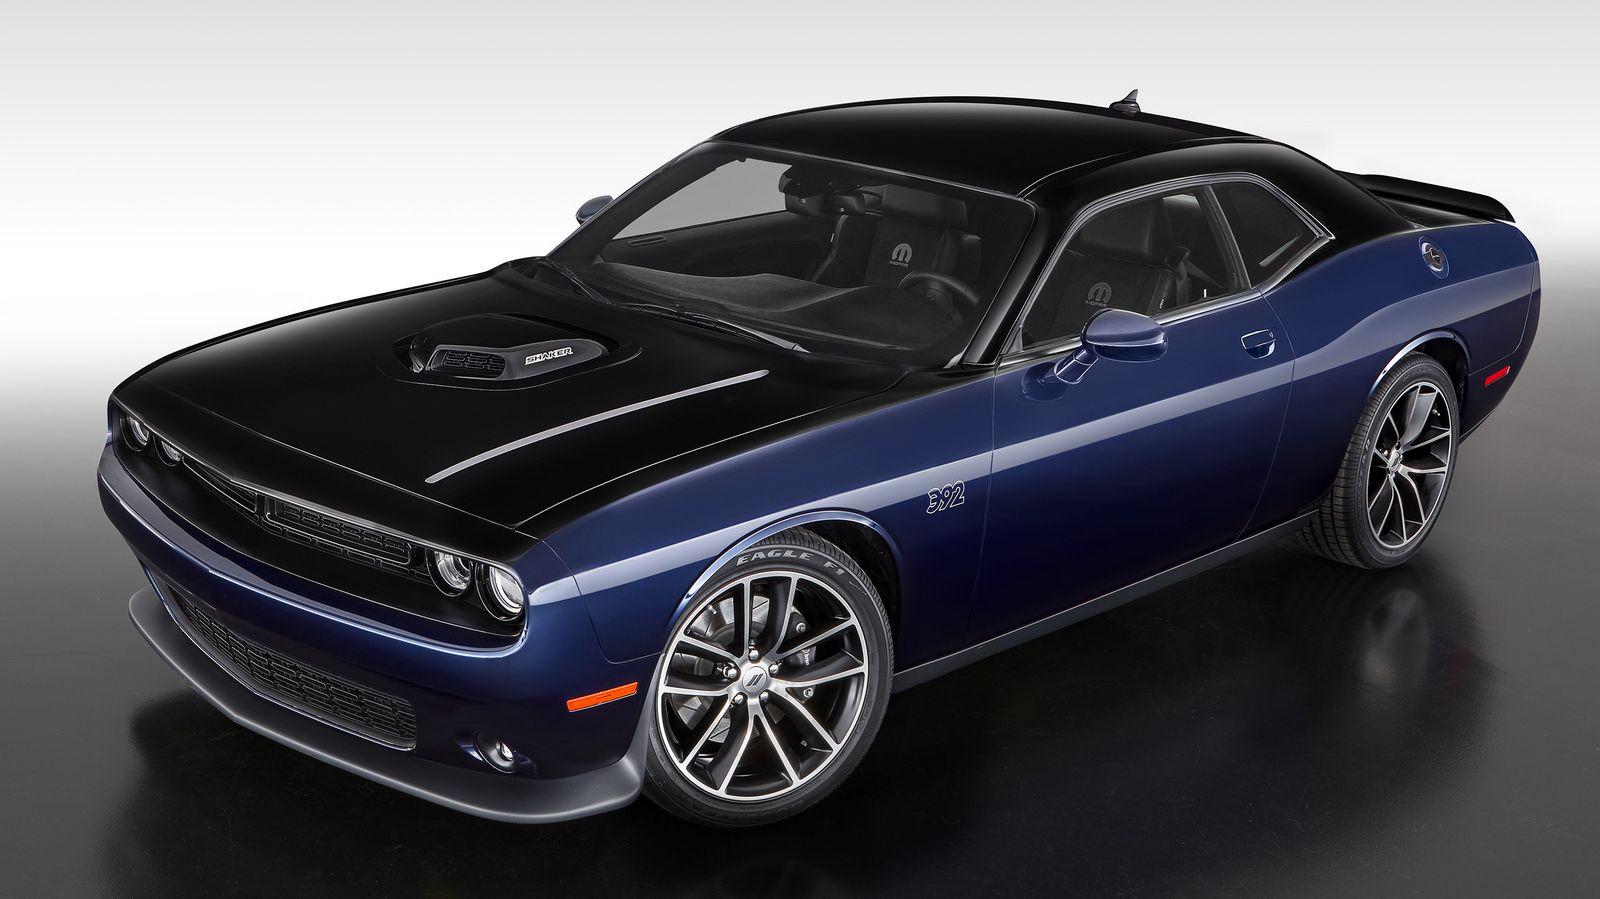 2014 - [Dodge] Challenger SRT - Page 3 2017%2BMopar%2BDodge%2BChallenger%2B-15